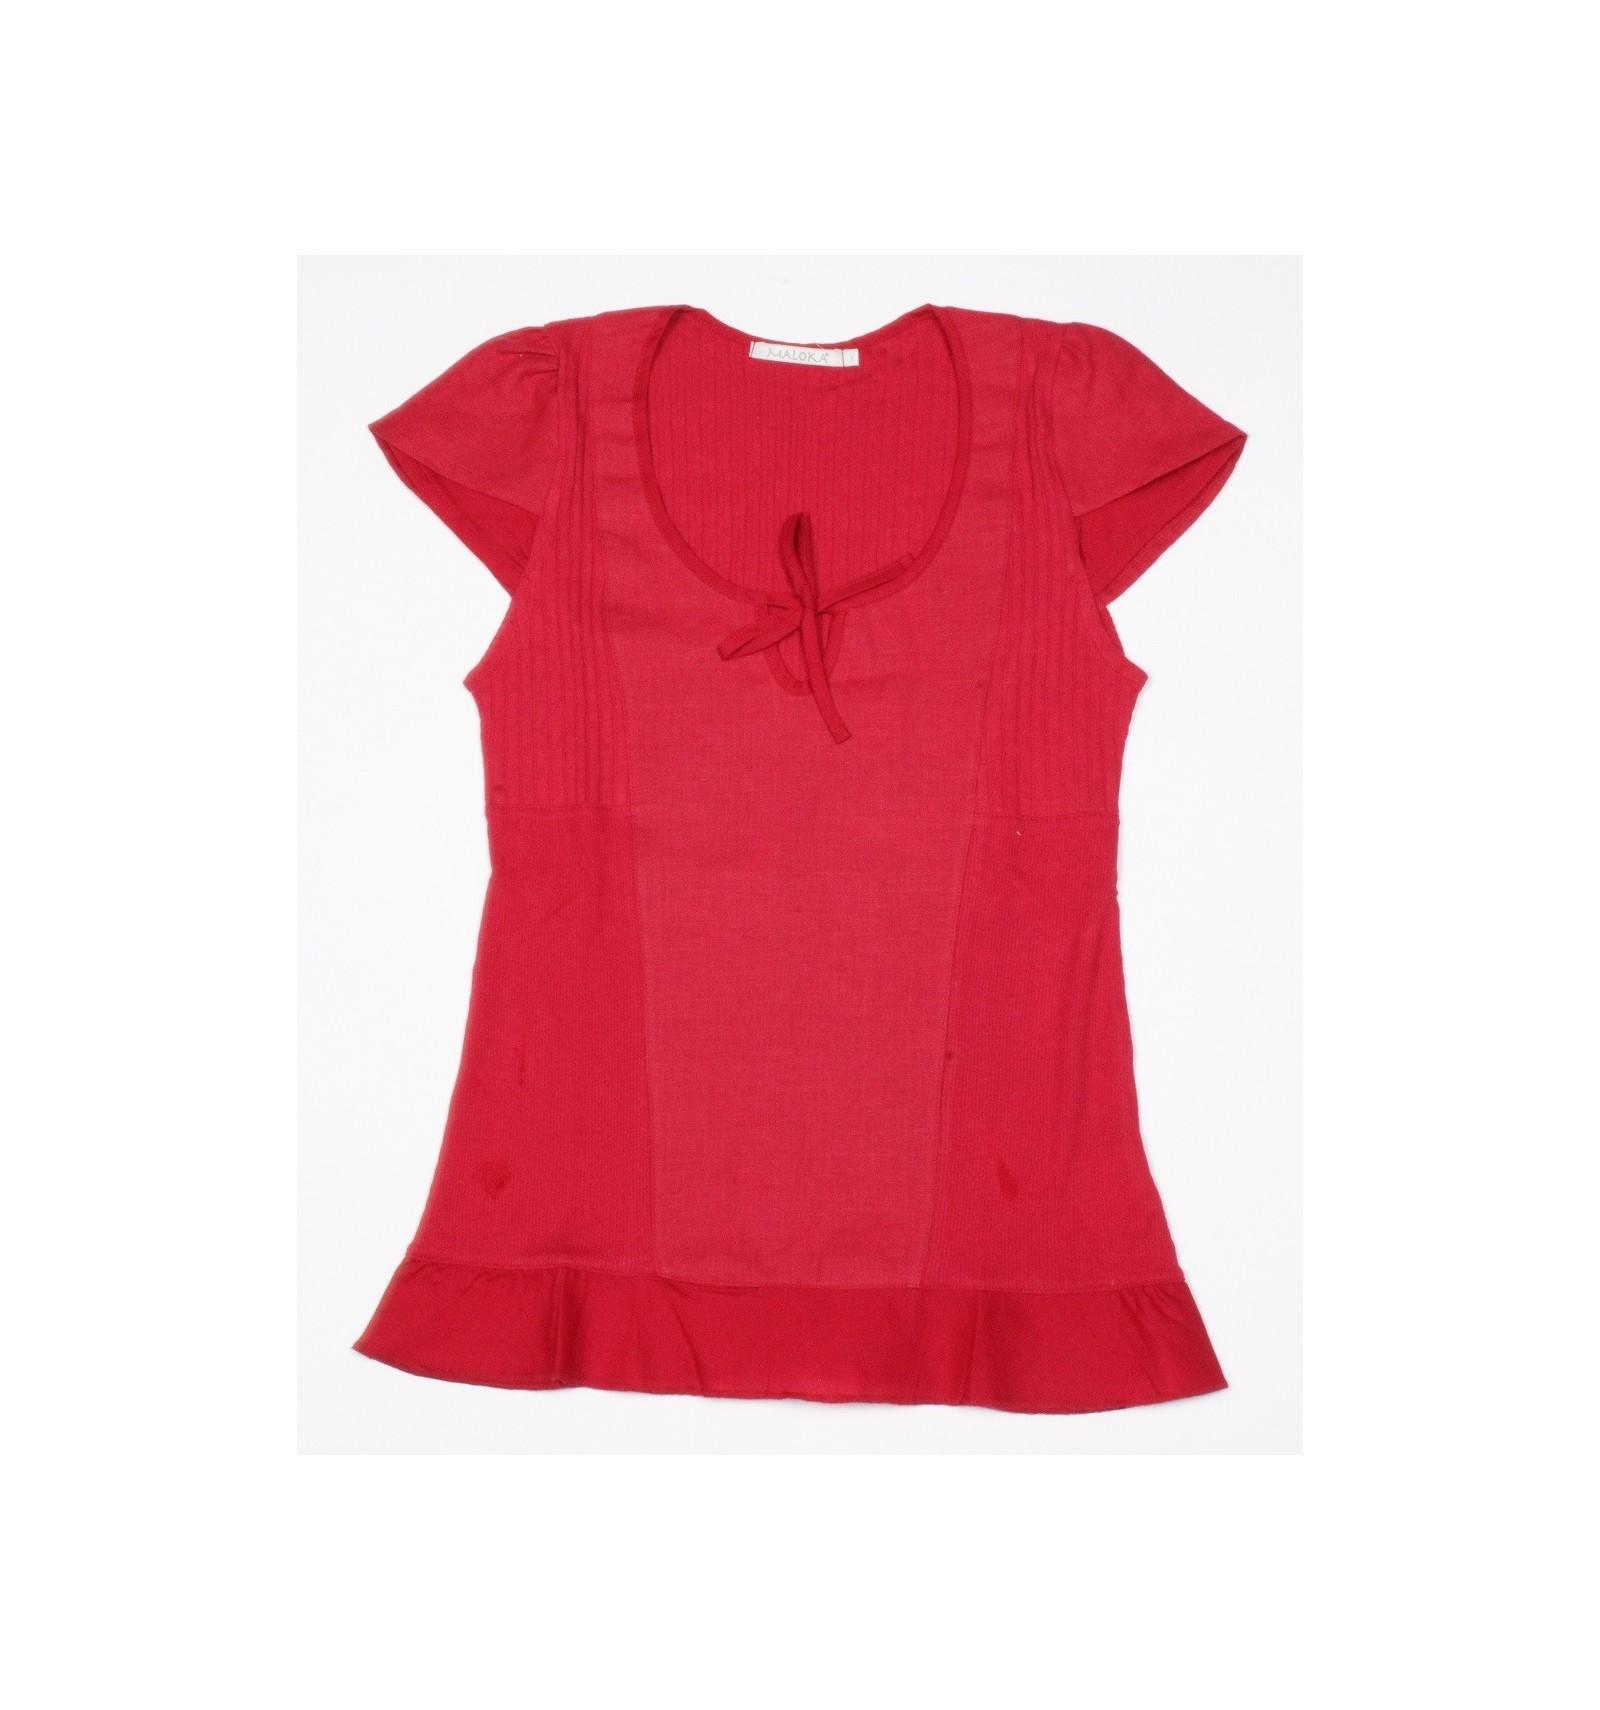 Couleur Framboise tee shirt maloka en lin et coton couleur framboise - albane